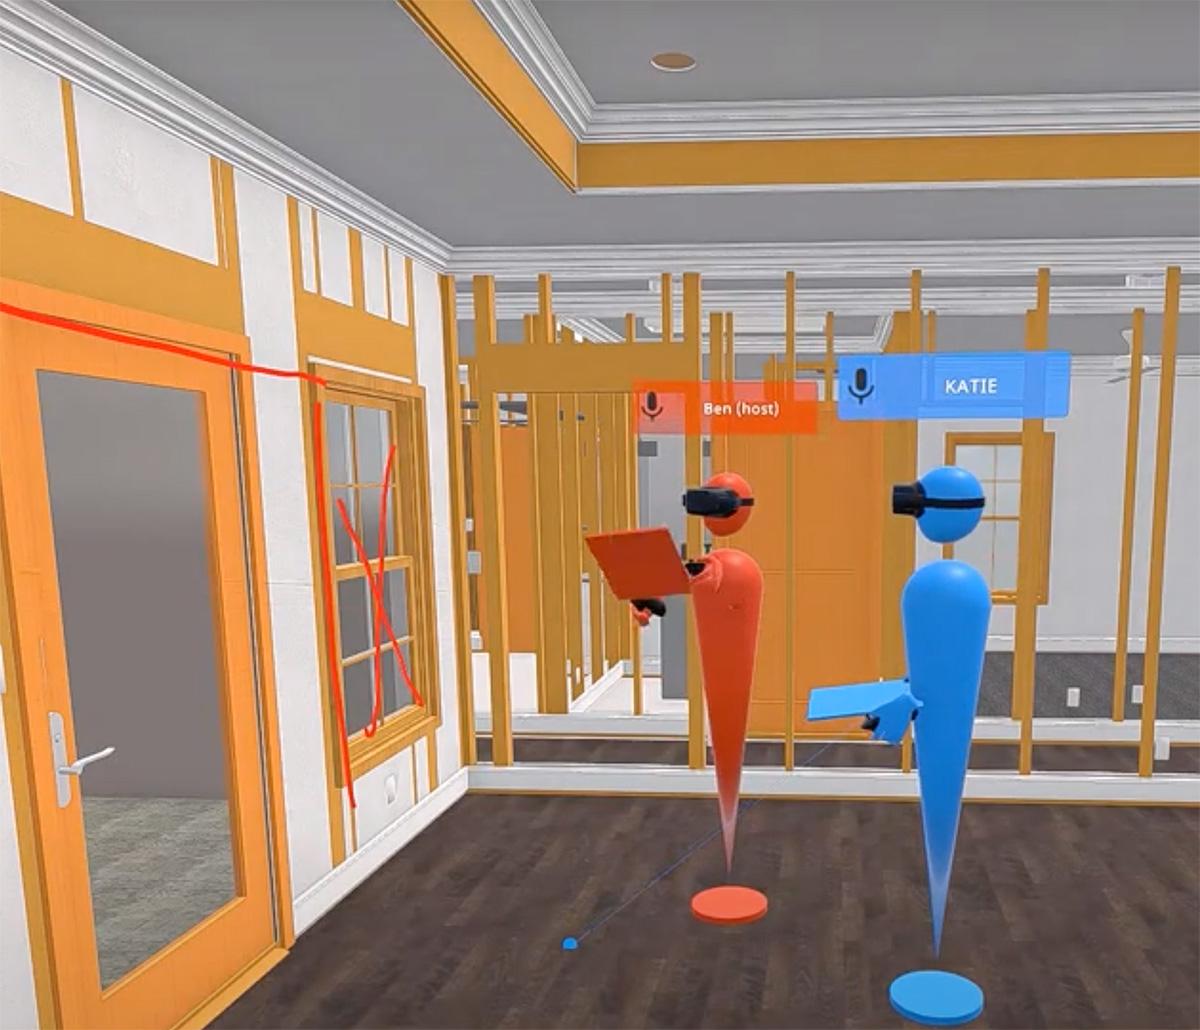 MiTek Visualization Services - Two 3D avatars standing in an AR jobsite